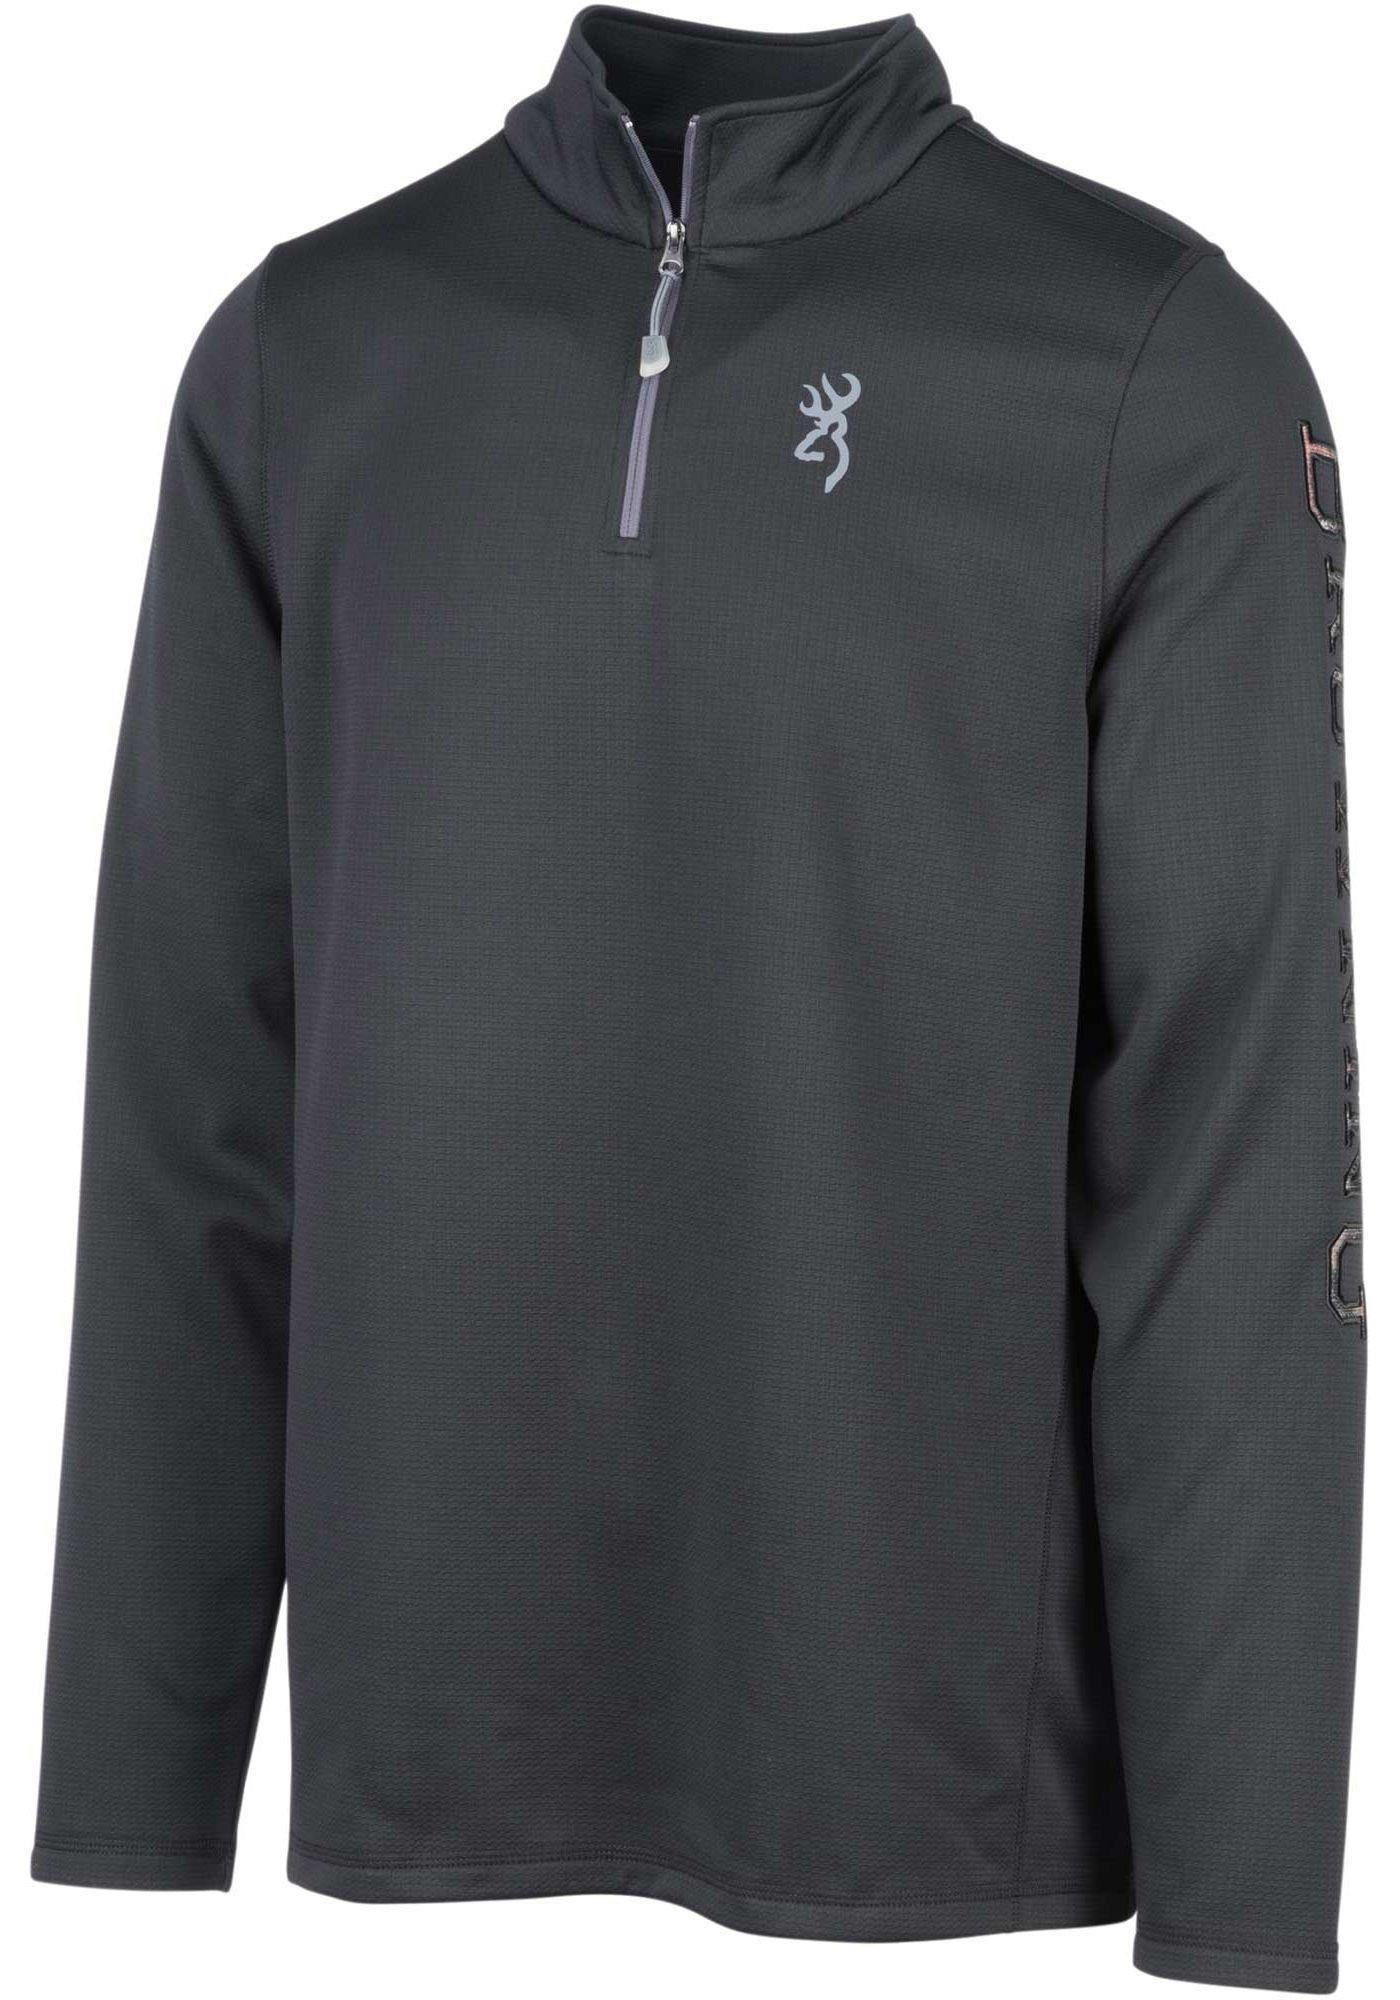 Browning Men's Pitch Quarter Zip Long Sleeve Shirt